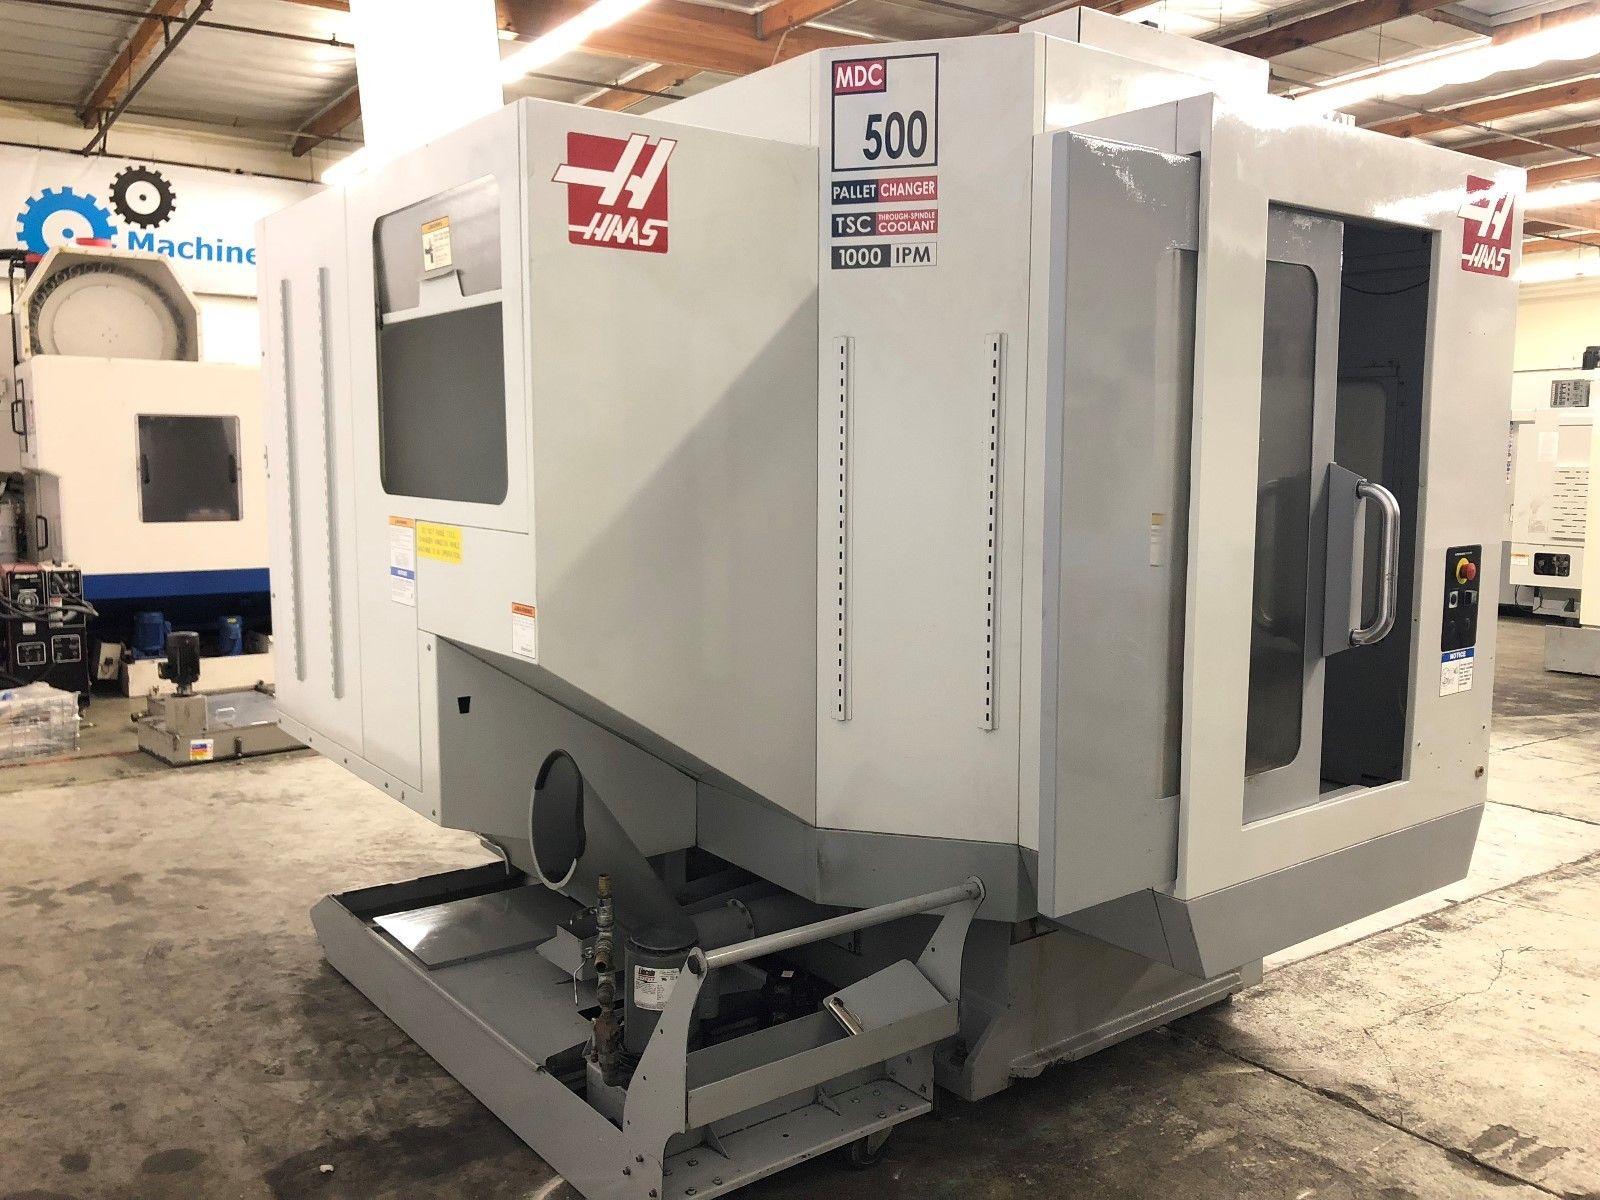 HAAS MDC-500 Mill Drill Tap Vertical Machining Center - MachineStation